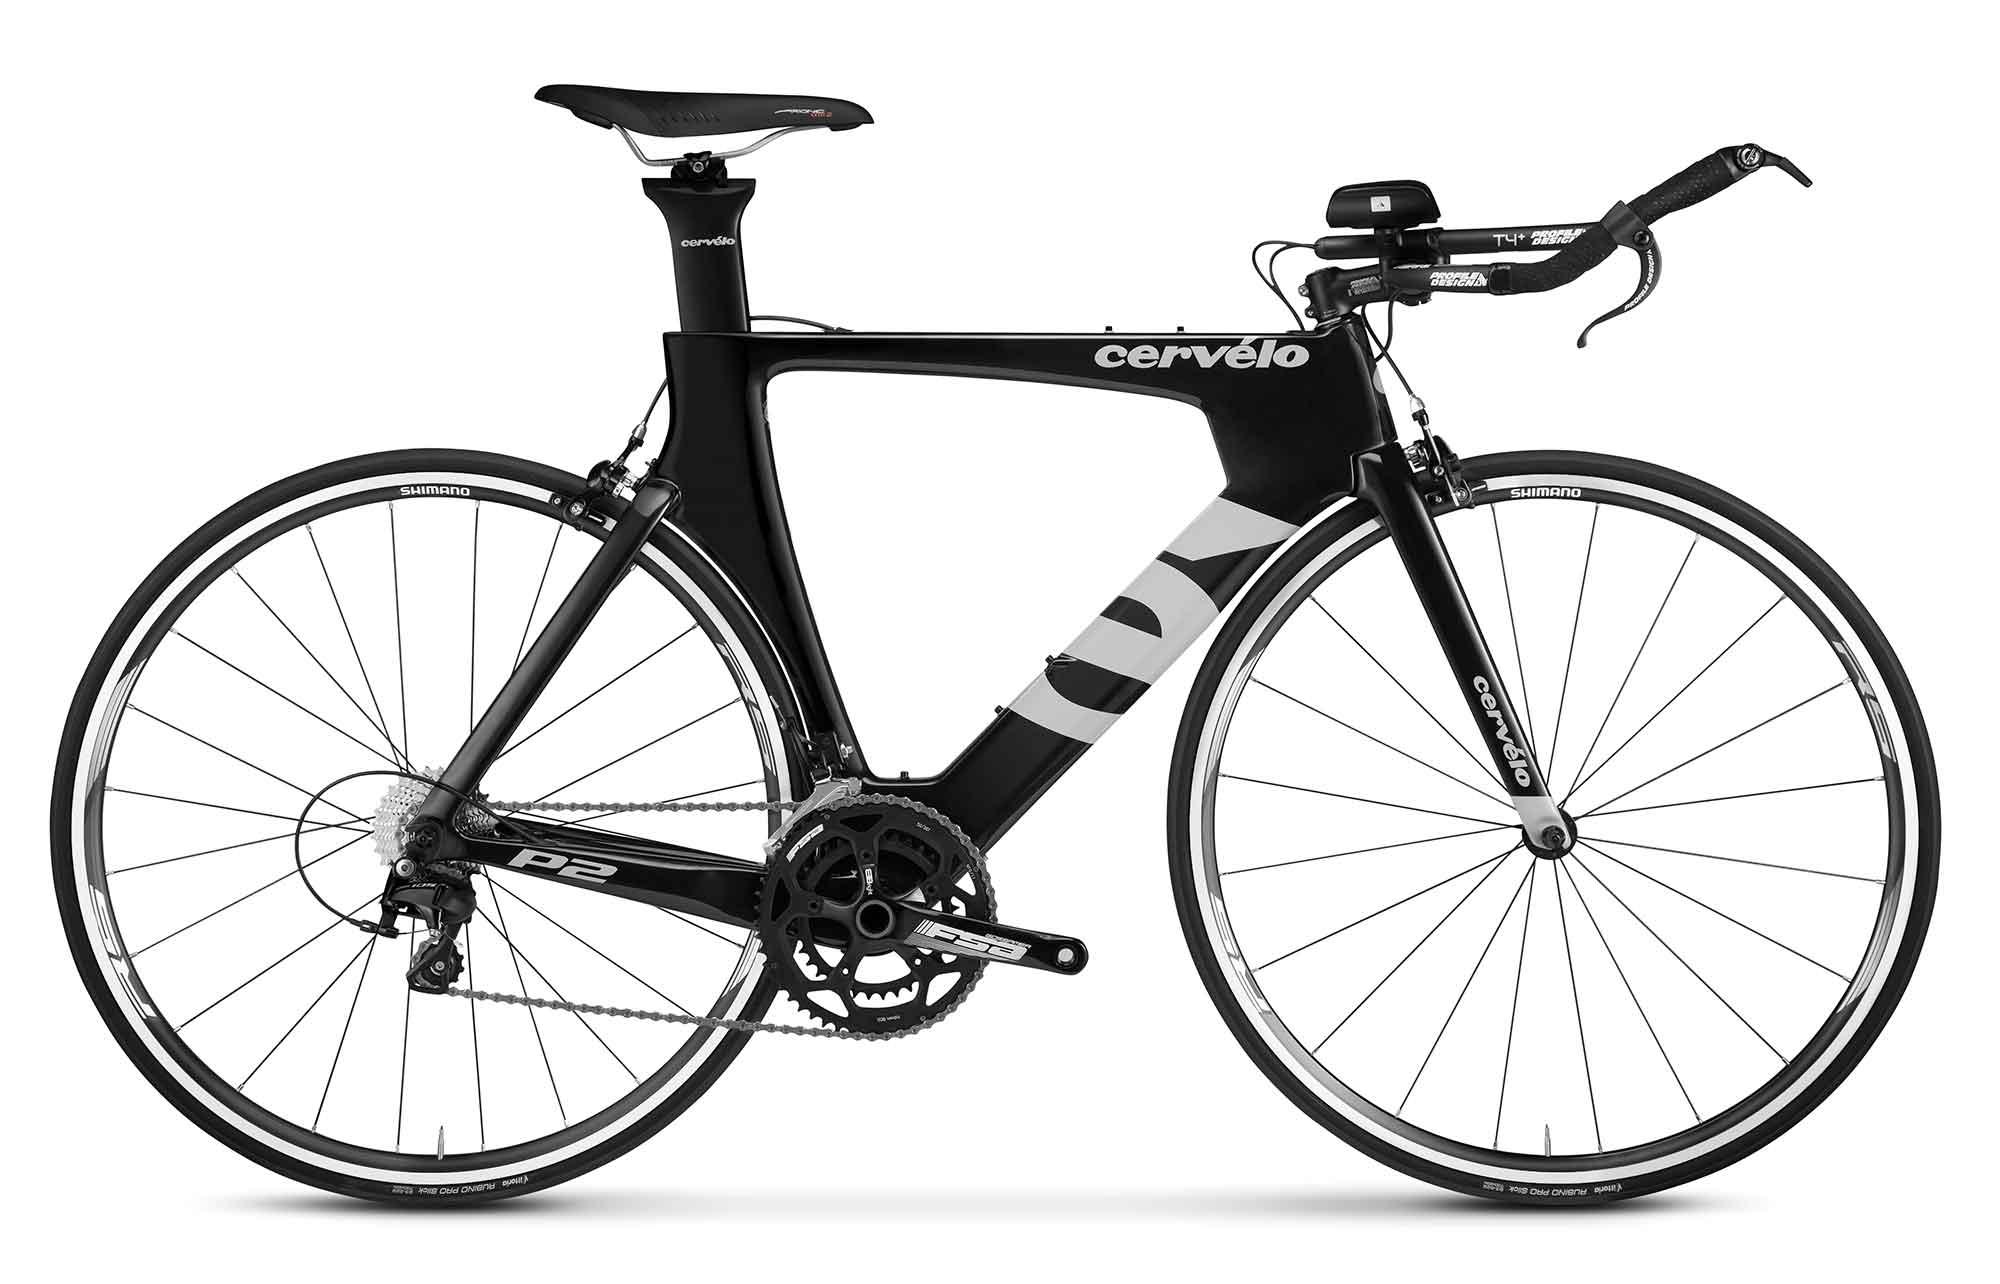 Cervelo P2 Triathlon/Time Trial Bike